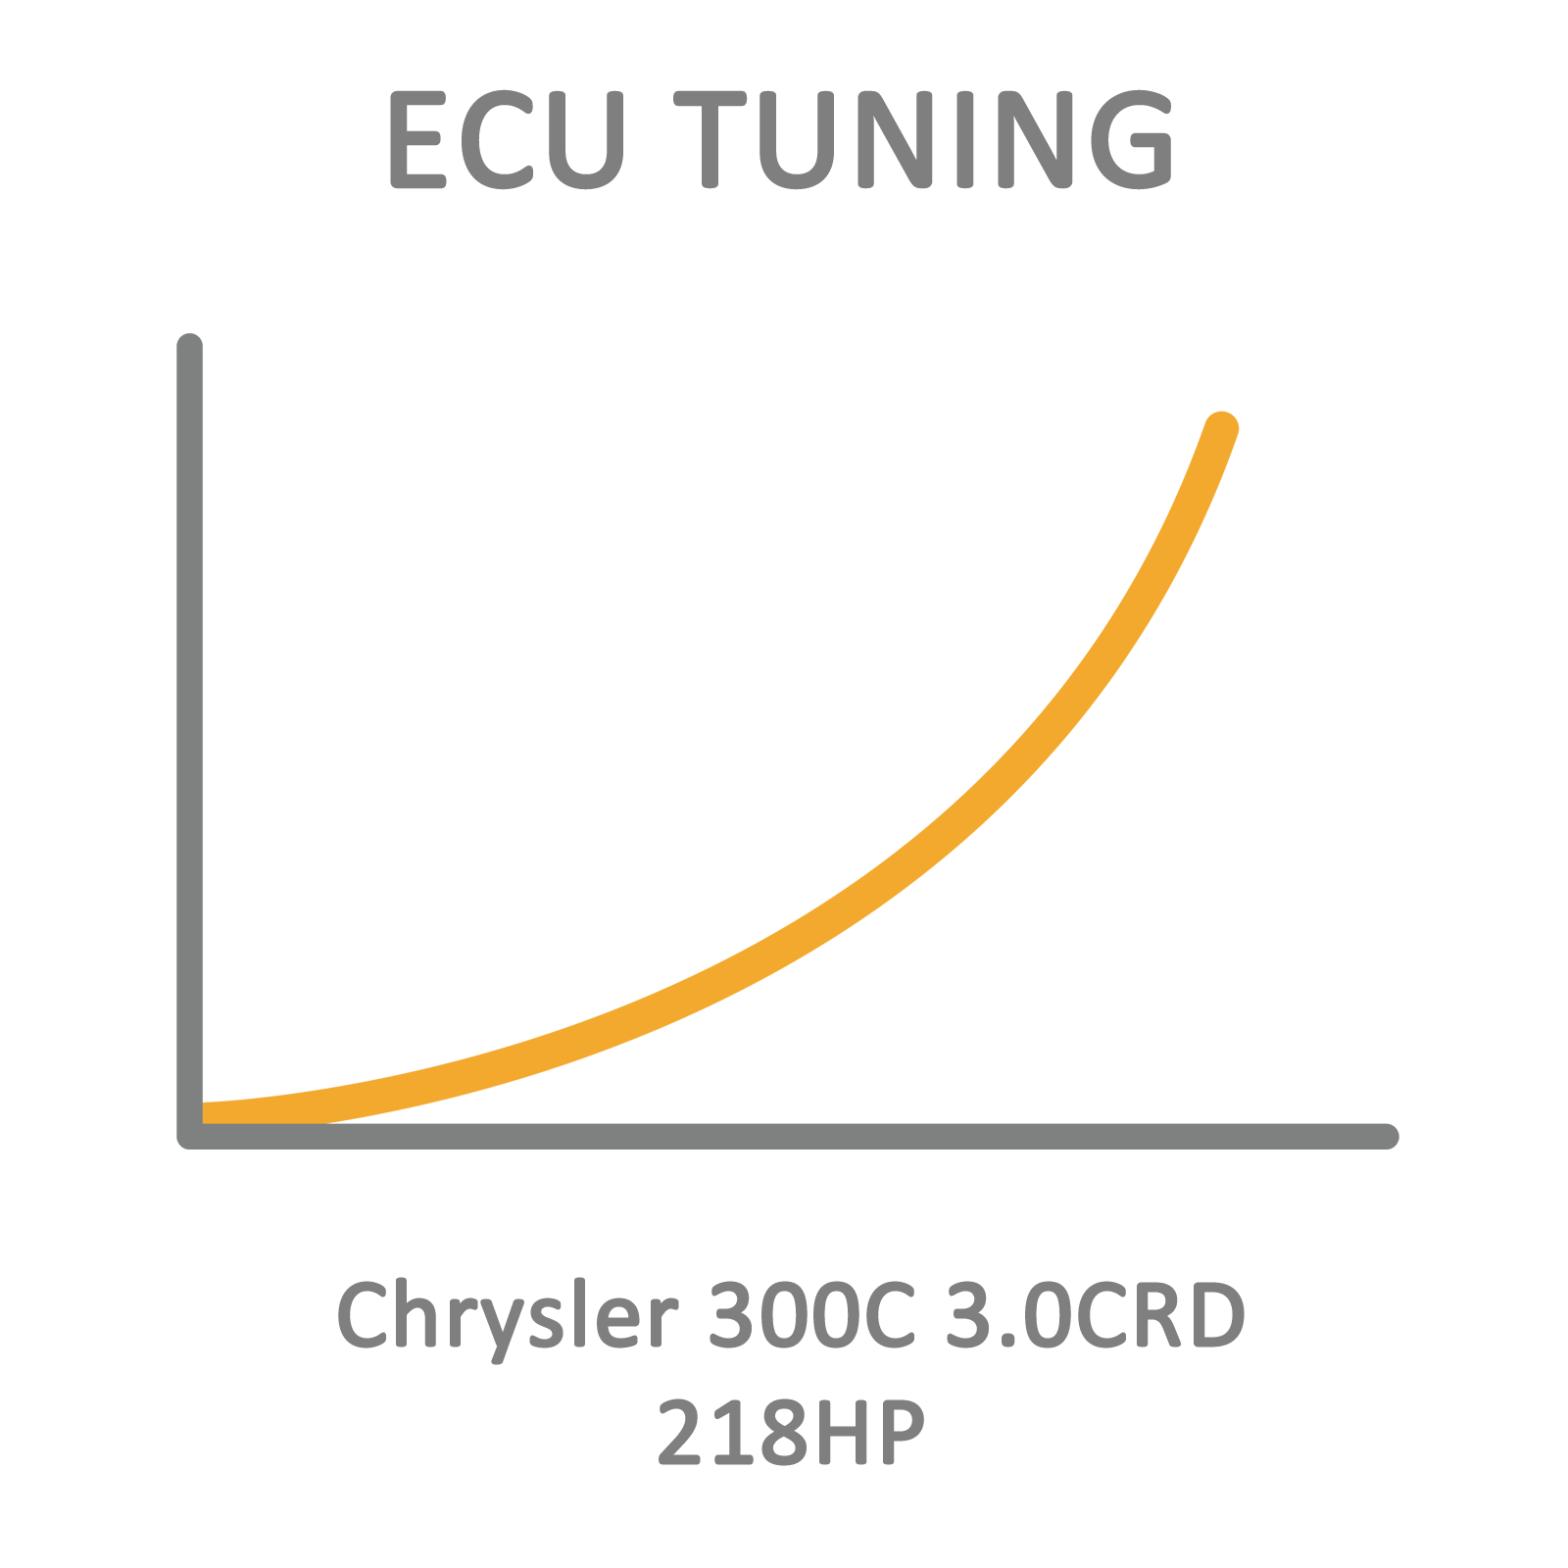 Chrysler 300C 3.0CRD 218HP ECU Tuning Remapping Programming